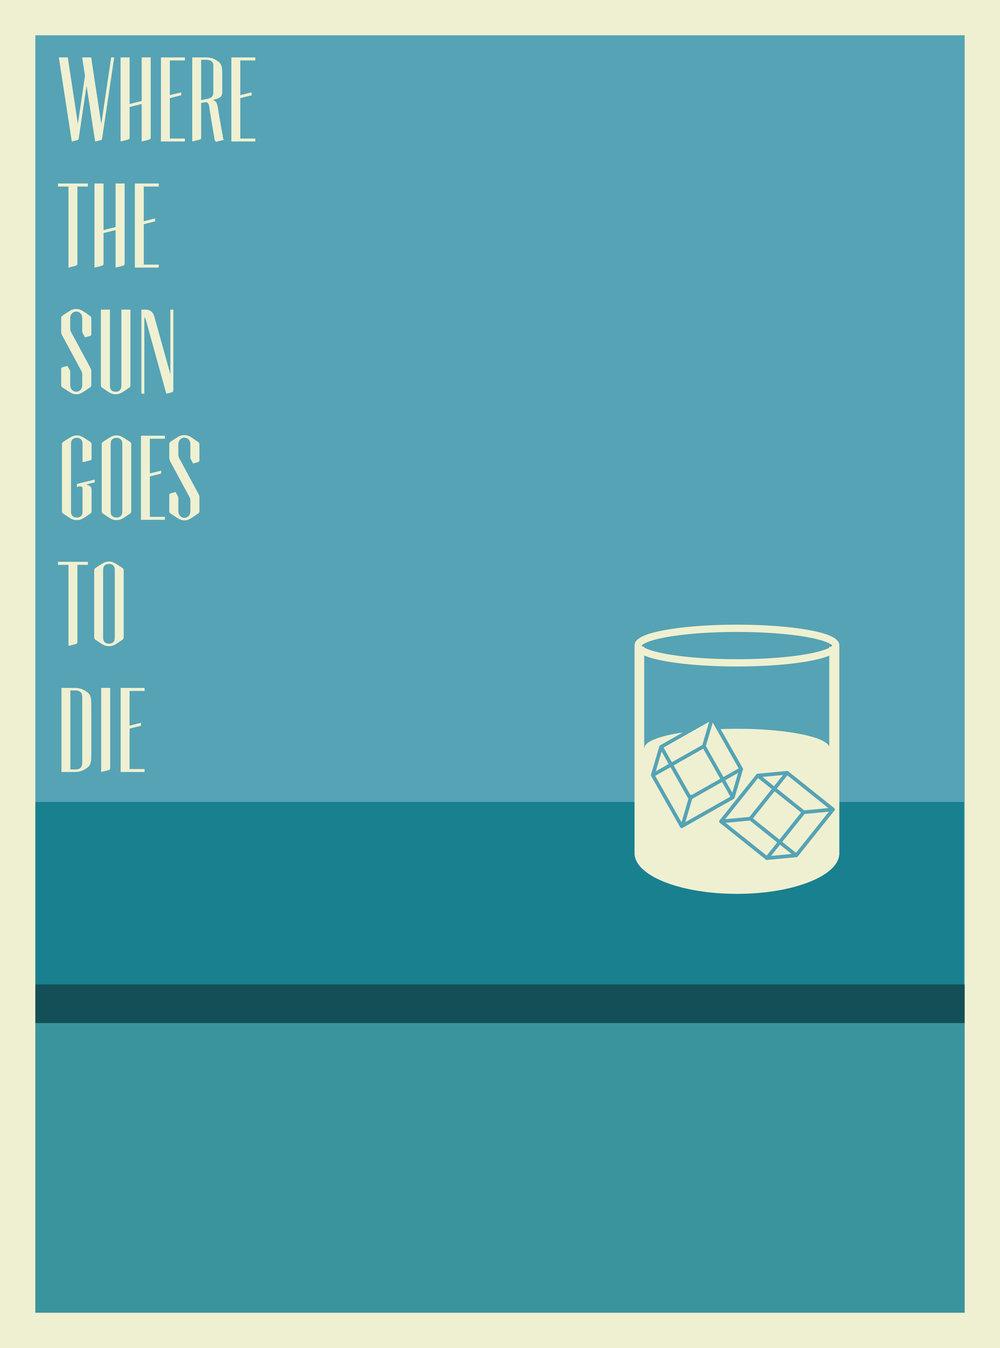 Sun-Poster.jpg